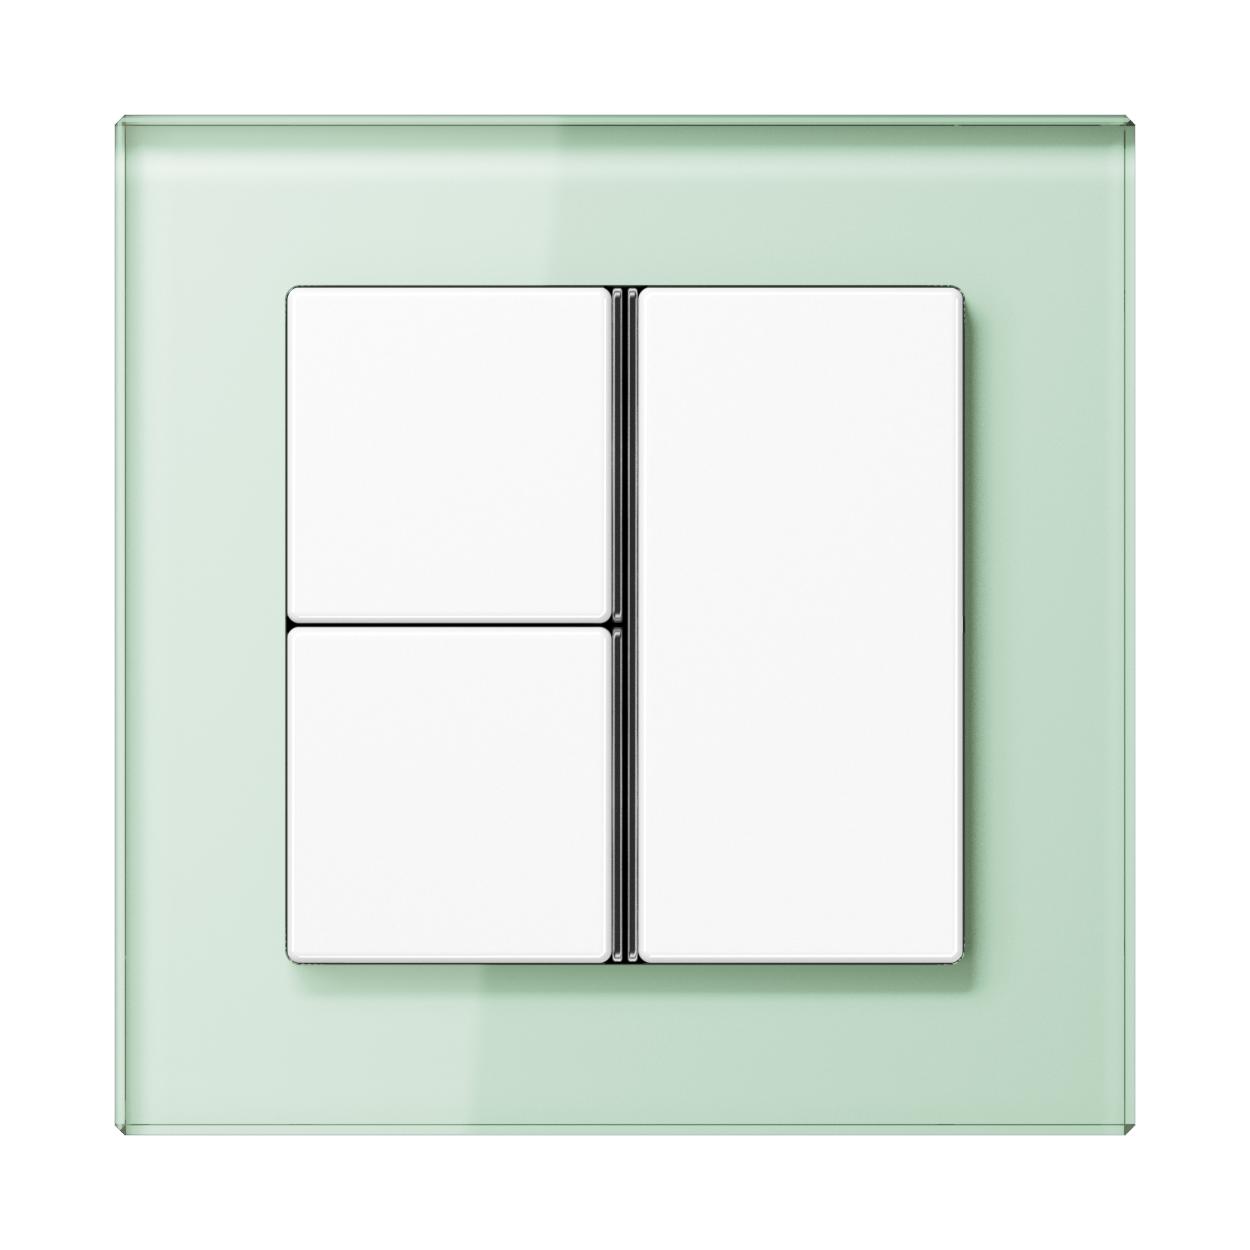 JUNG_AC_GL_soft-white_3button